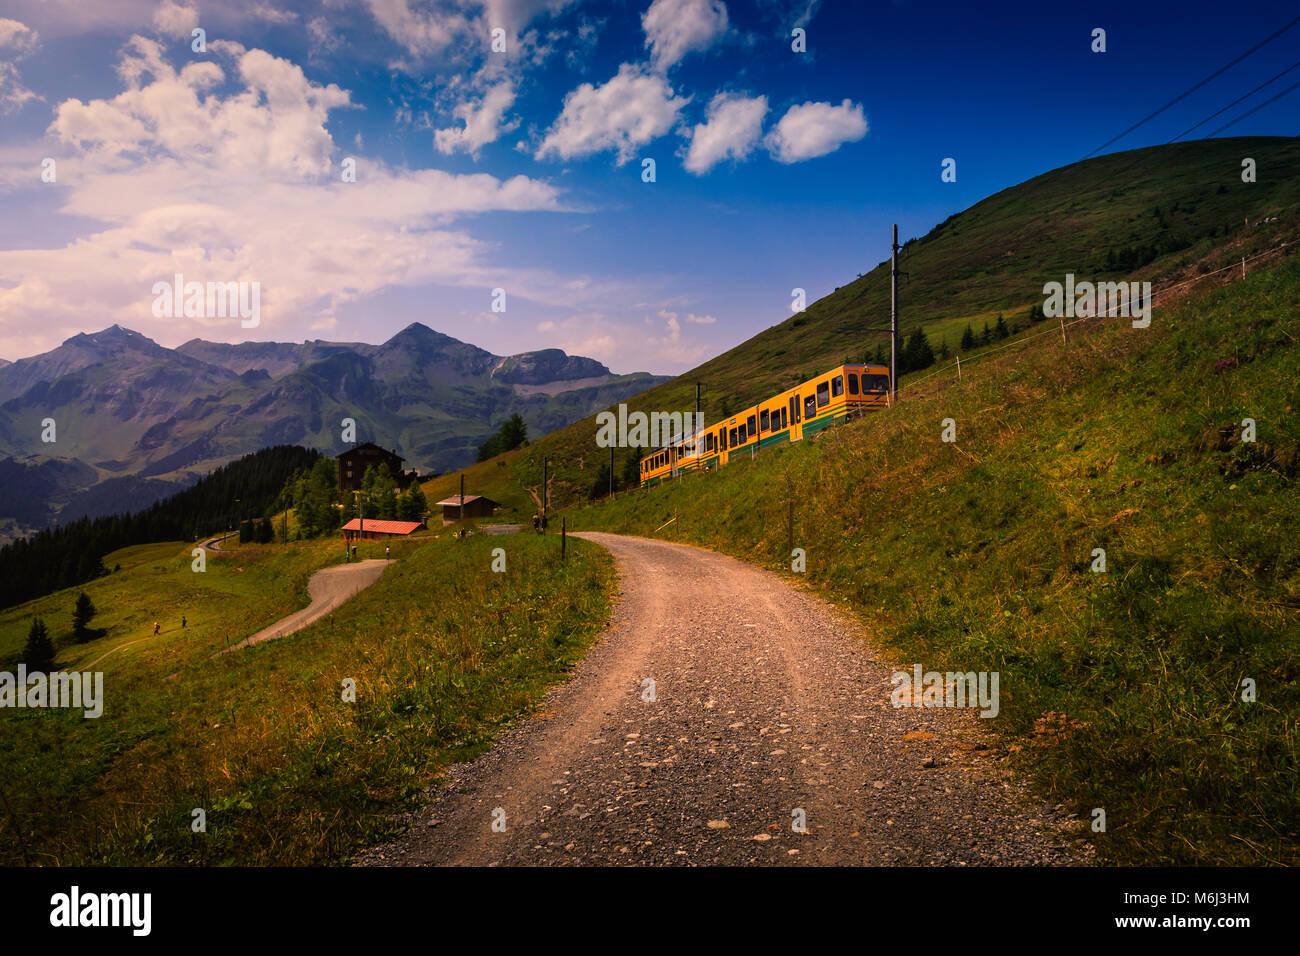 Colorful landscape in the Jungfrau region with the mountain train from Lauterbrunnen to Kleine Scheidegg. Wengen, Stock Photo